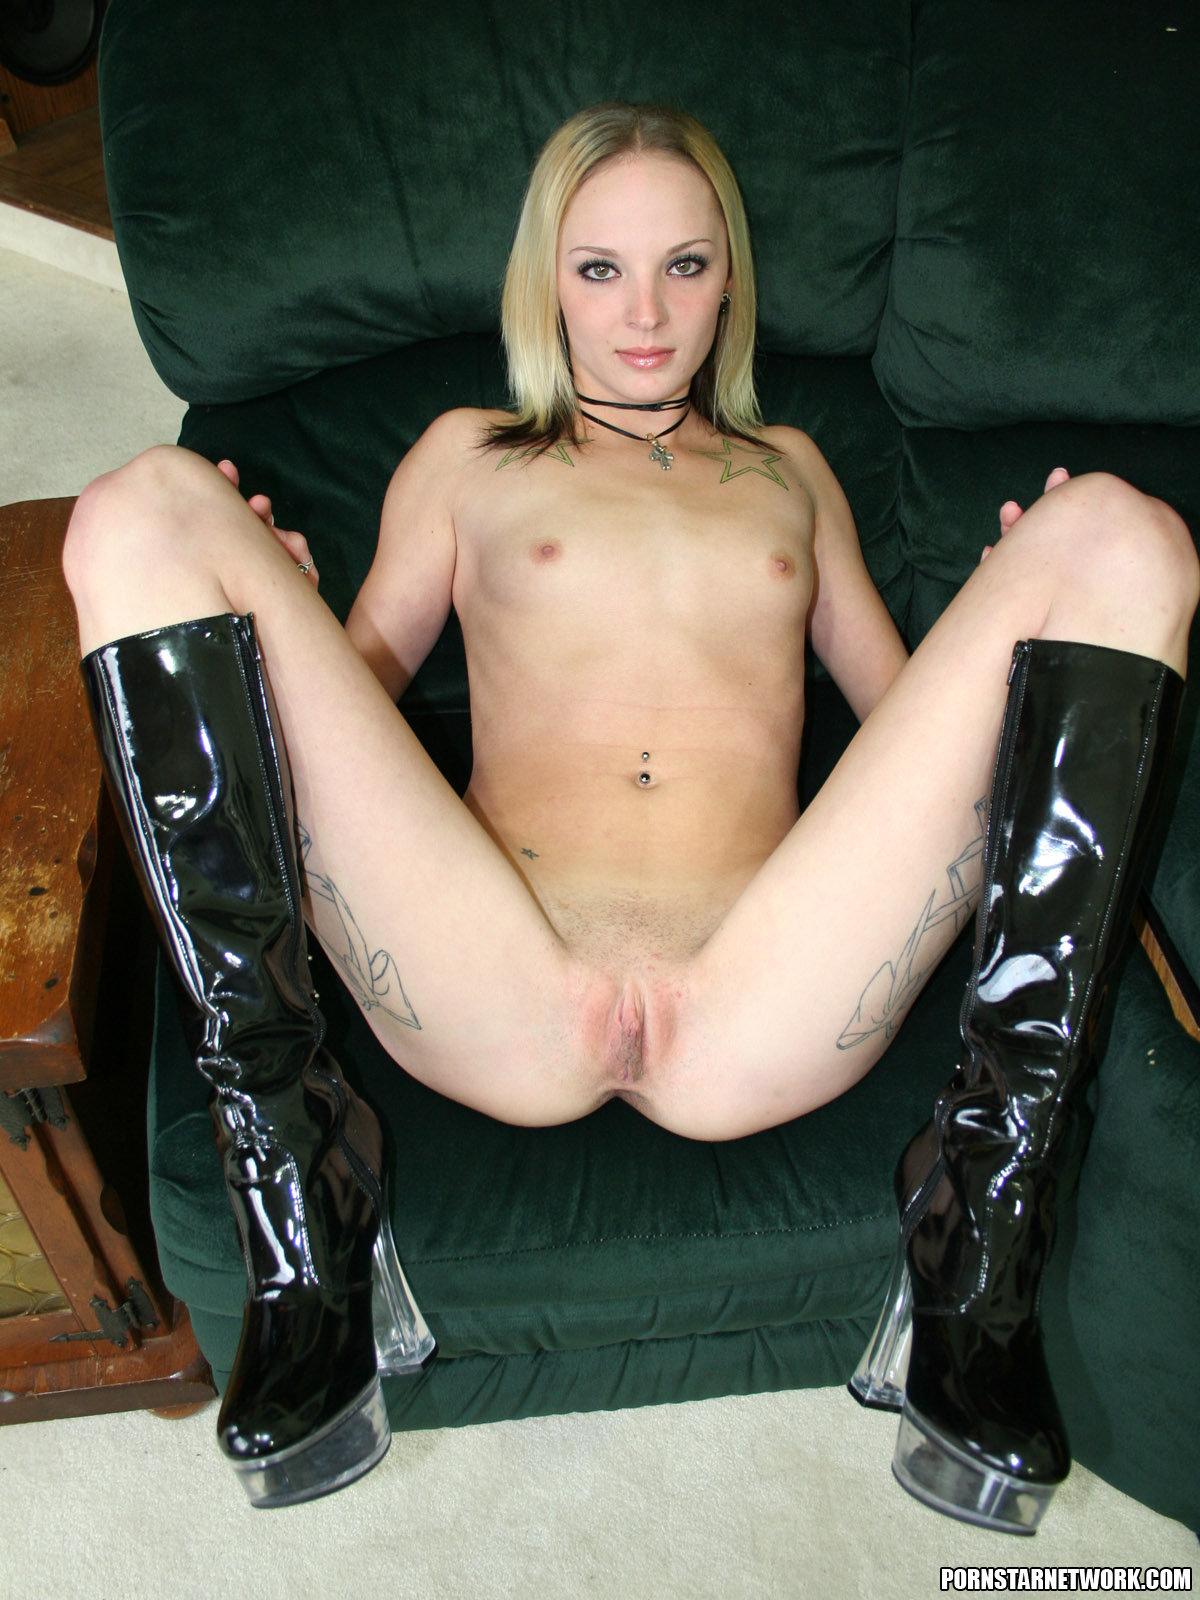 Faye runaway nude, free thick latina bubbles pic thumbs